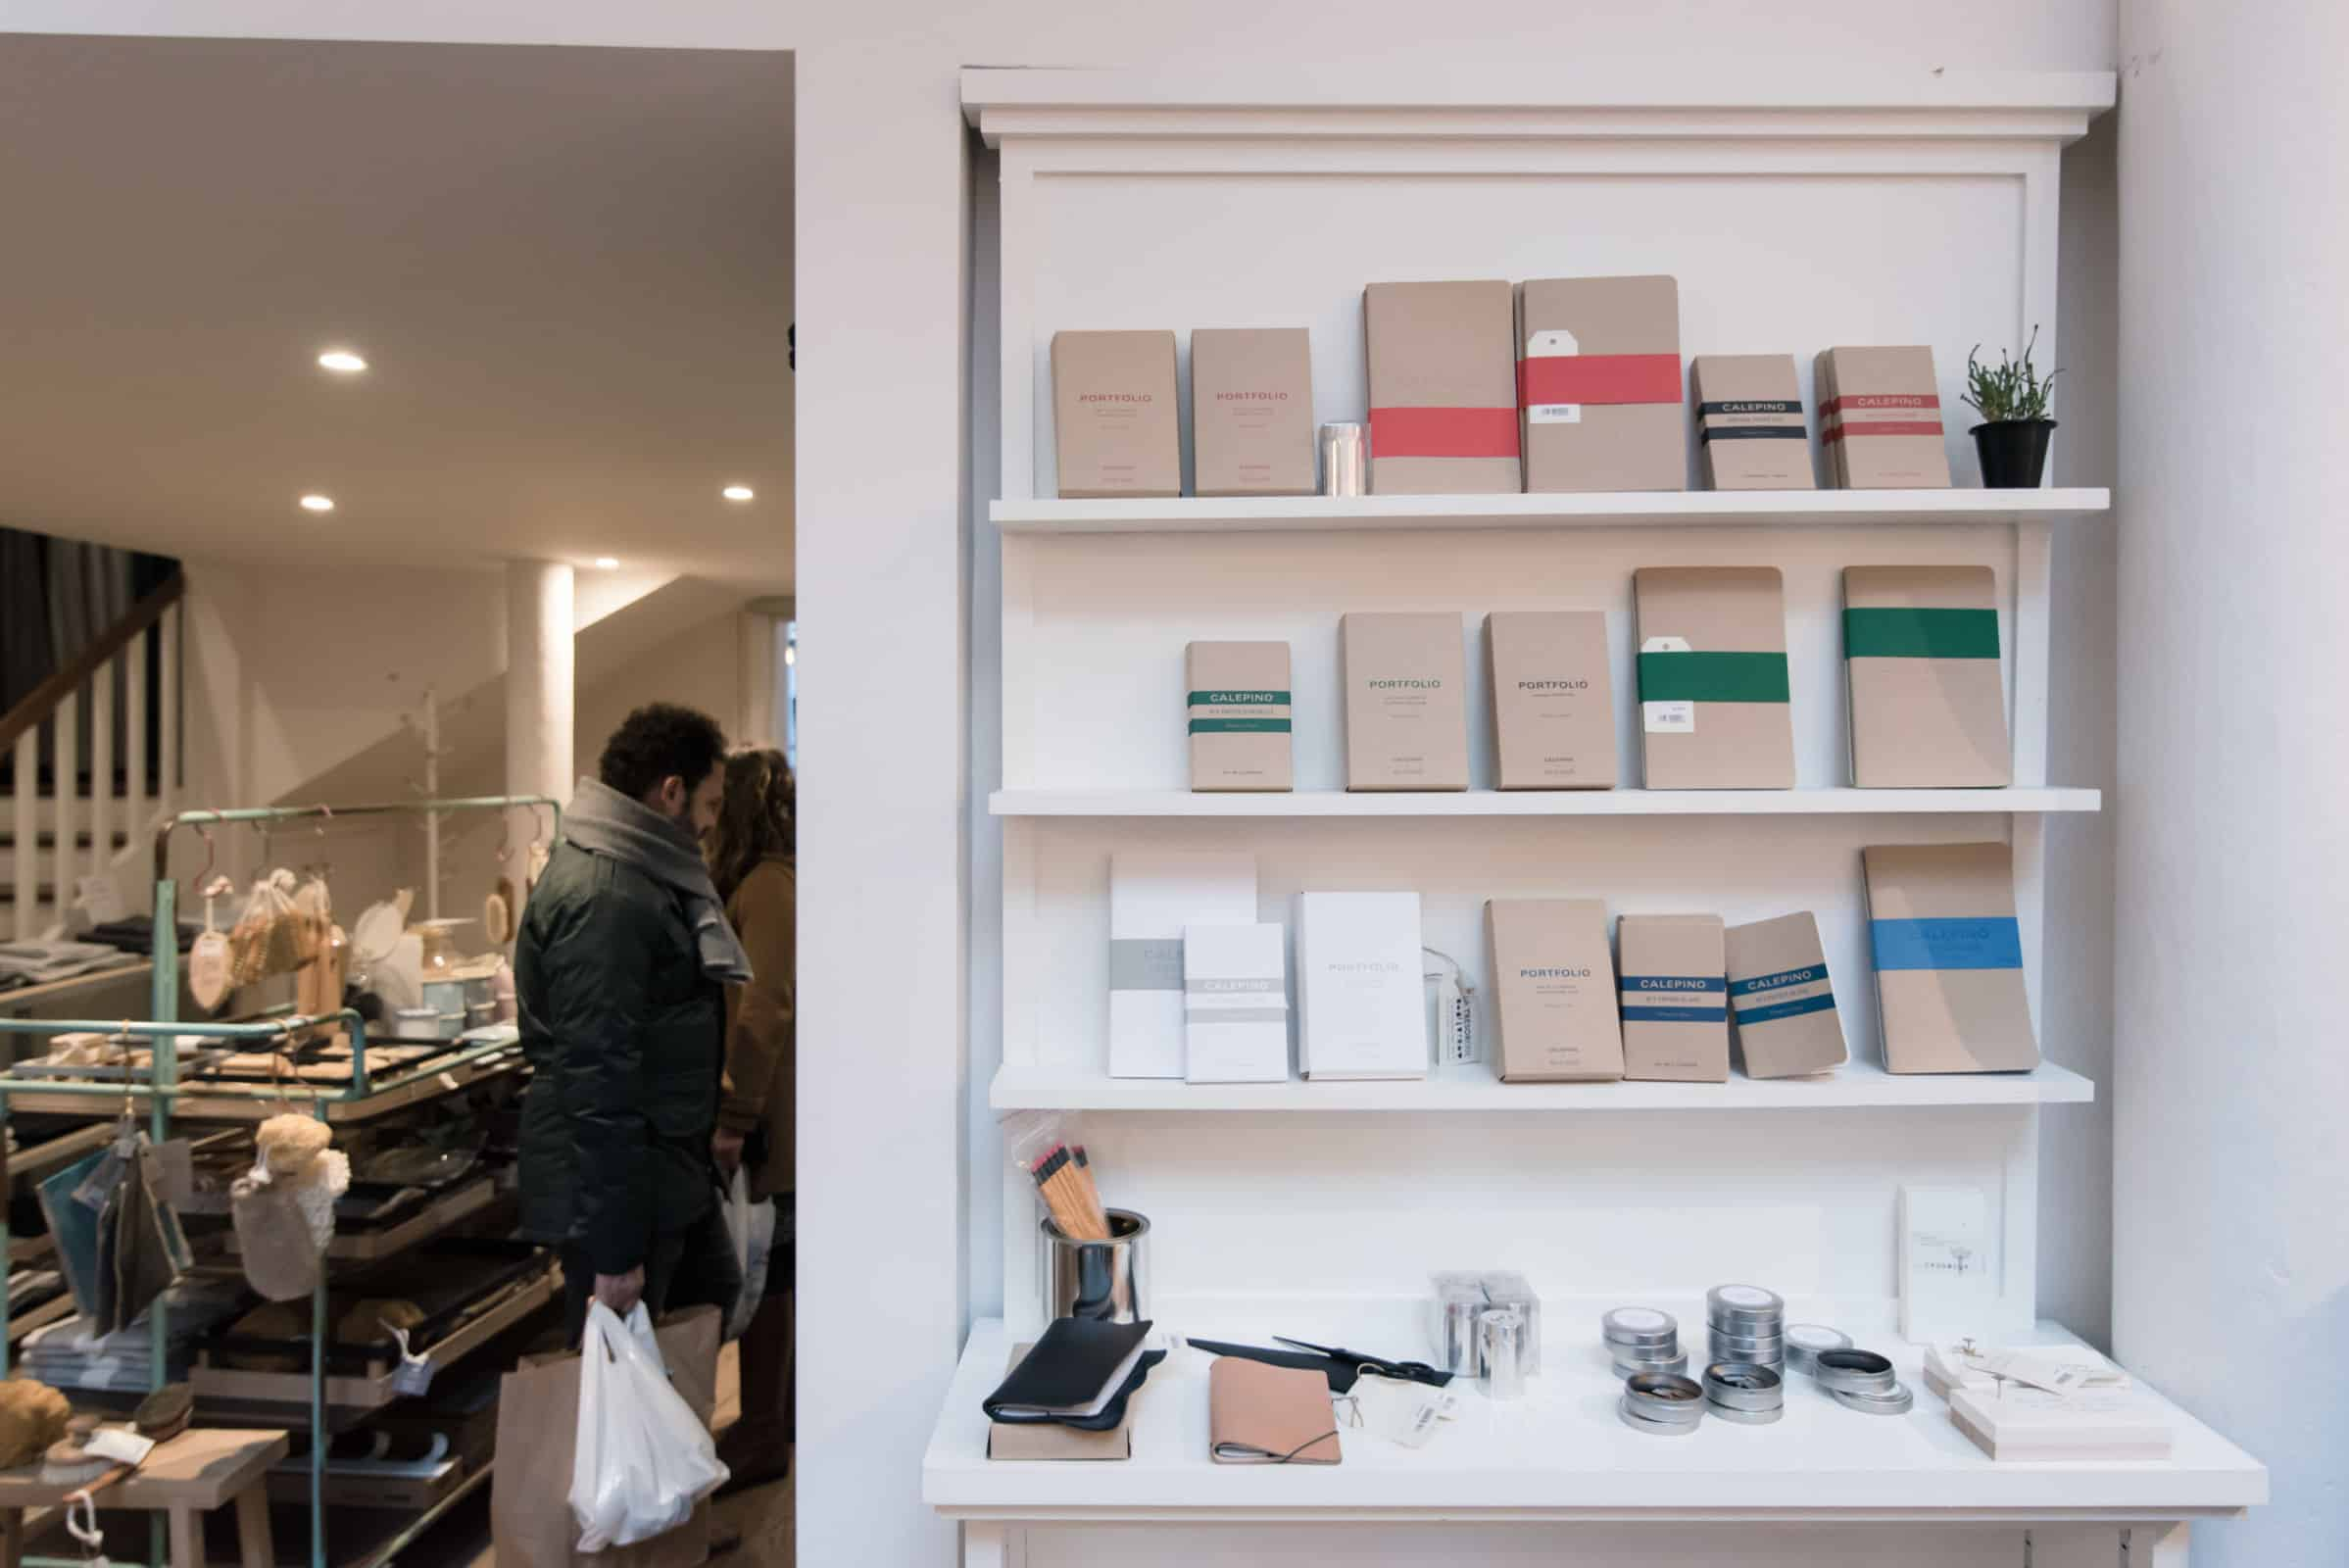 Negozi di design a Parigi - design shop in Paris